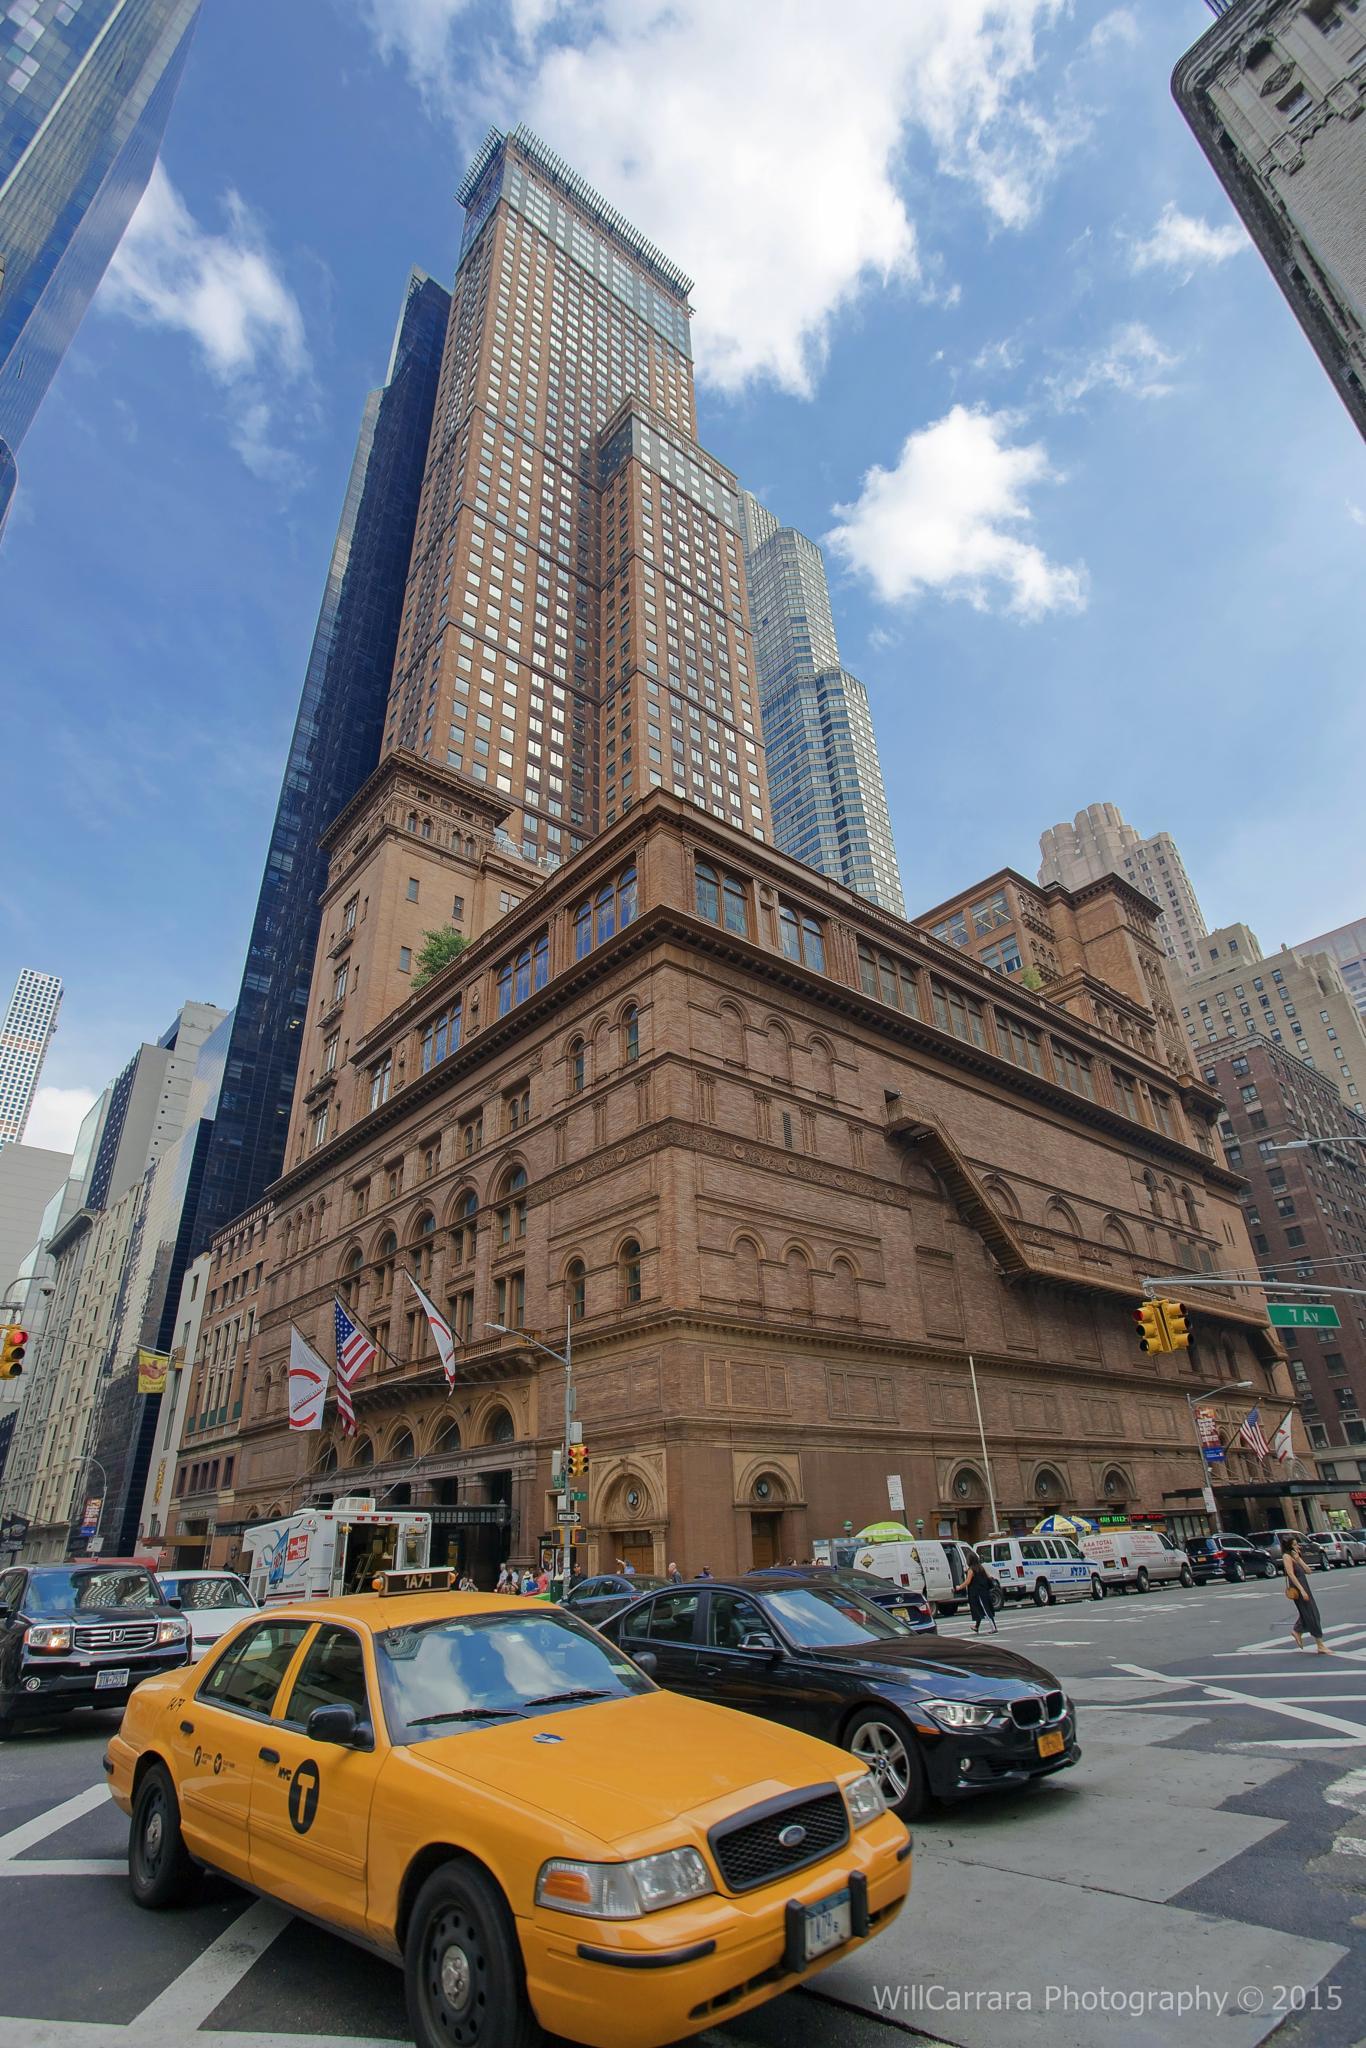 Street Photography - New York jun 2015 Carnegie Hall by Will Carrara Photographer